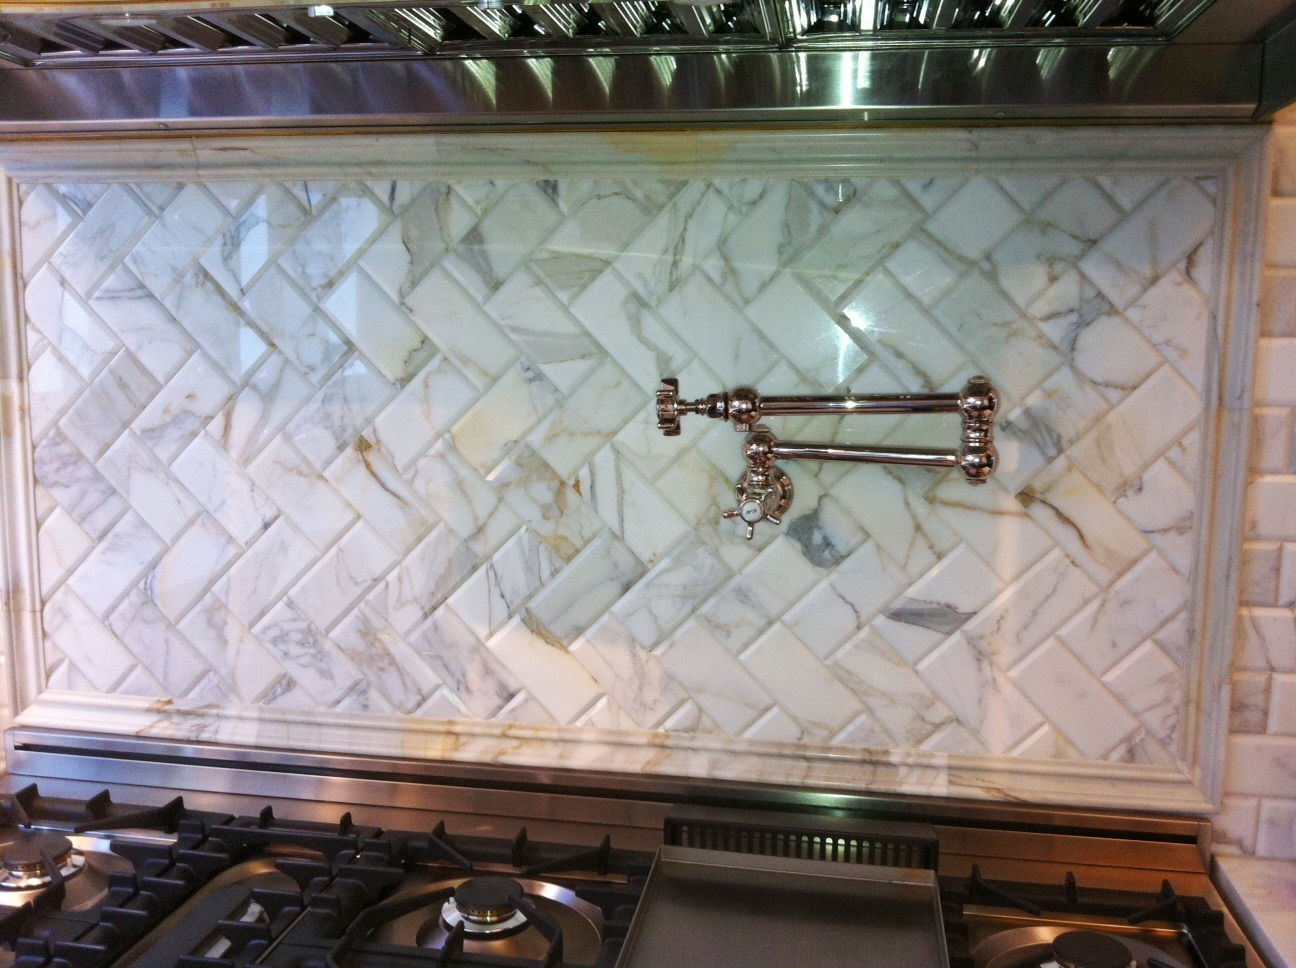 kitchen backsplash patterns 30 gallon trash can inside out design inspiration herringbone